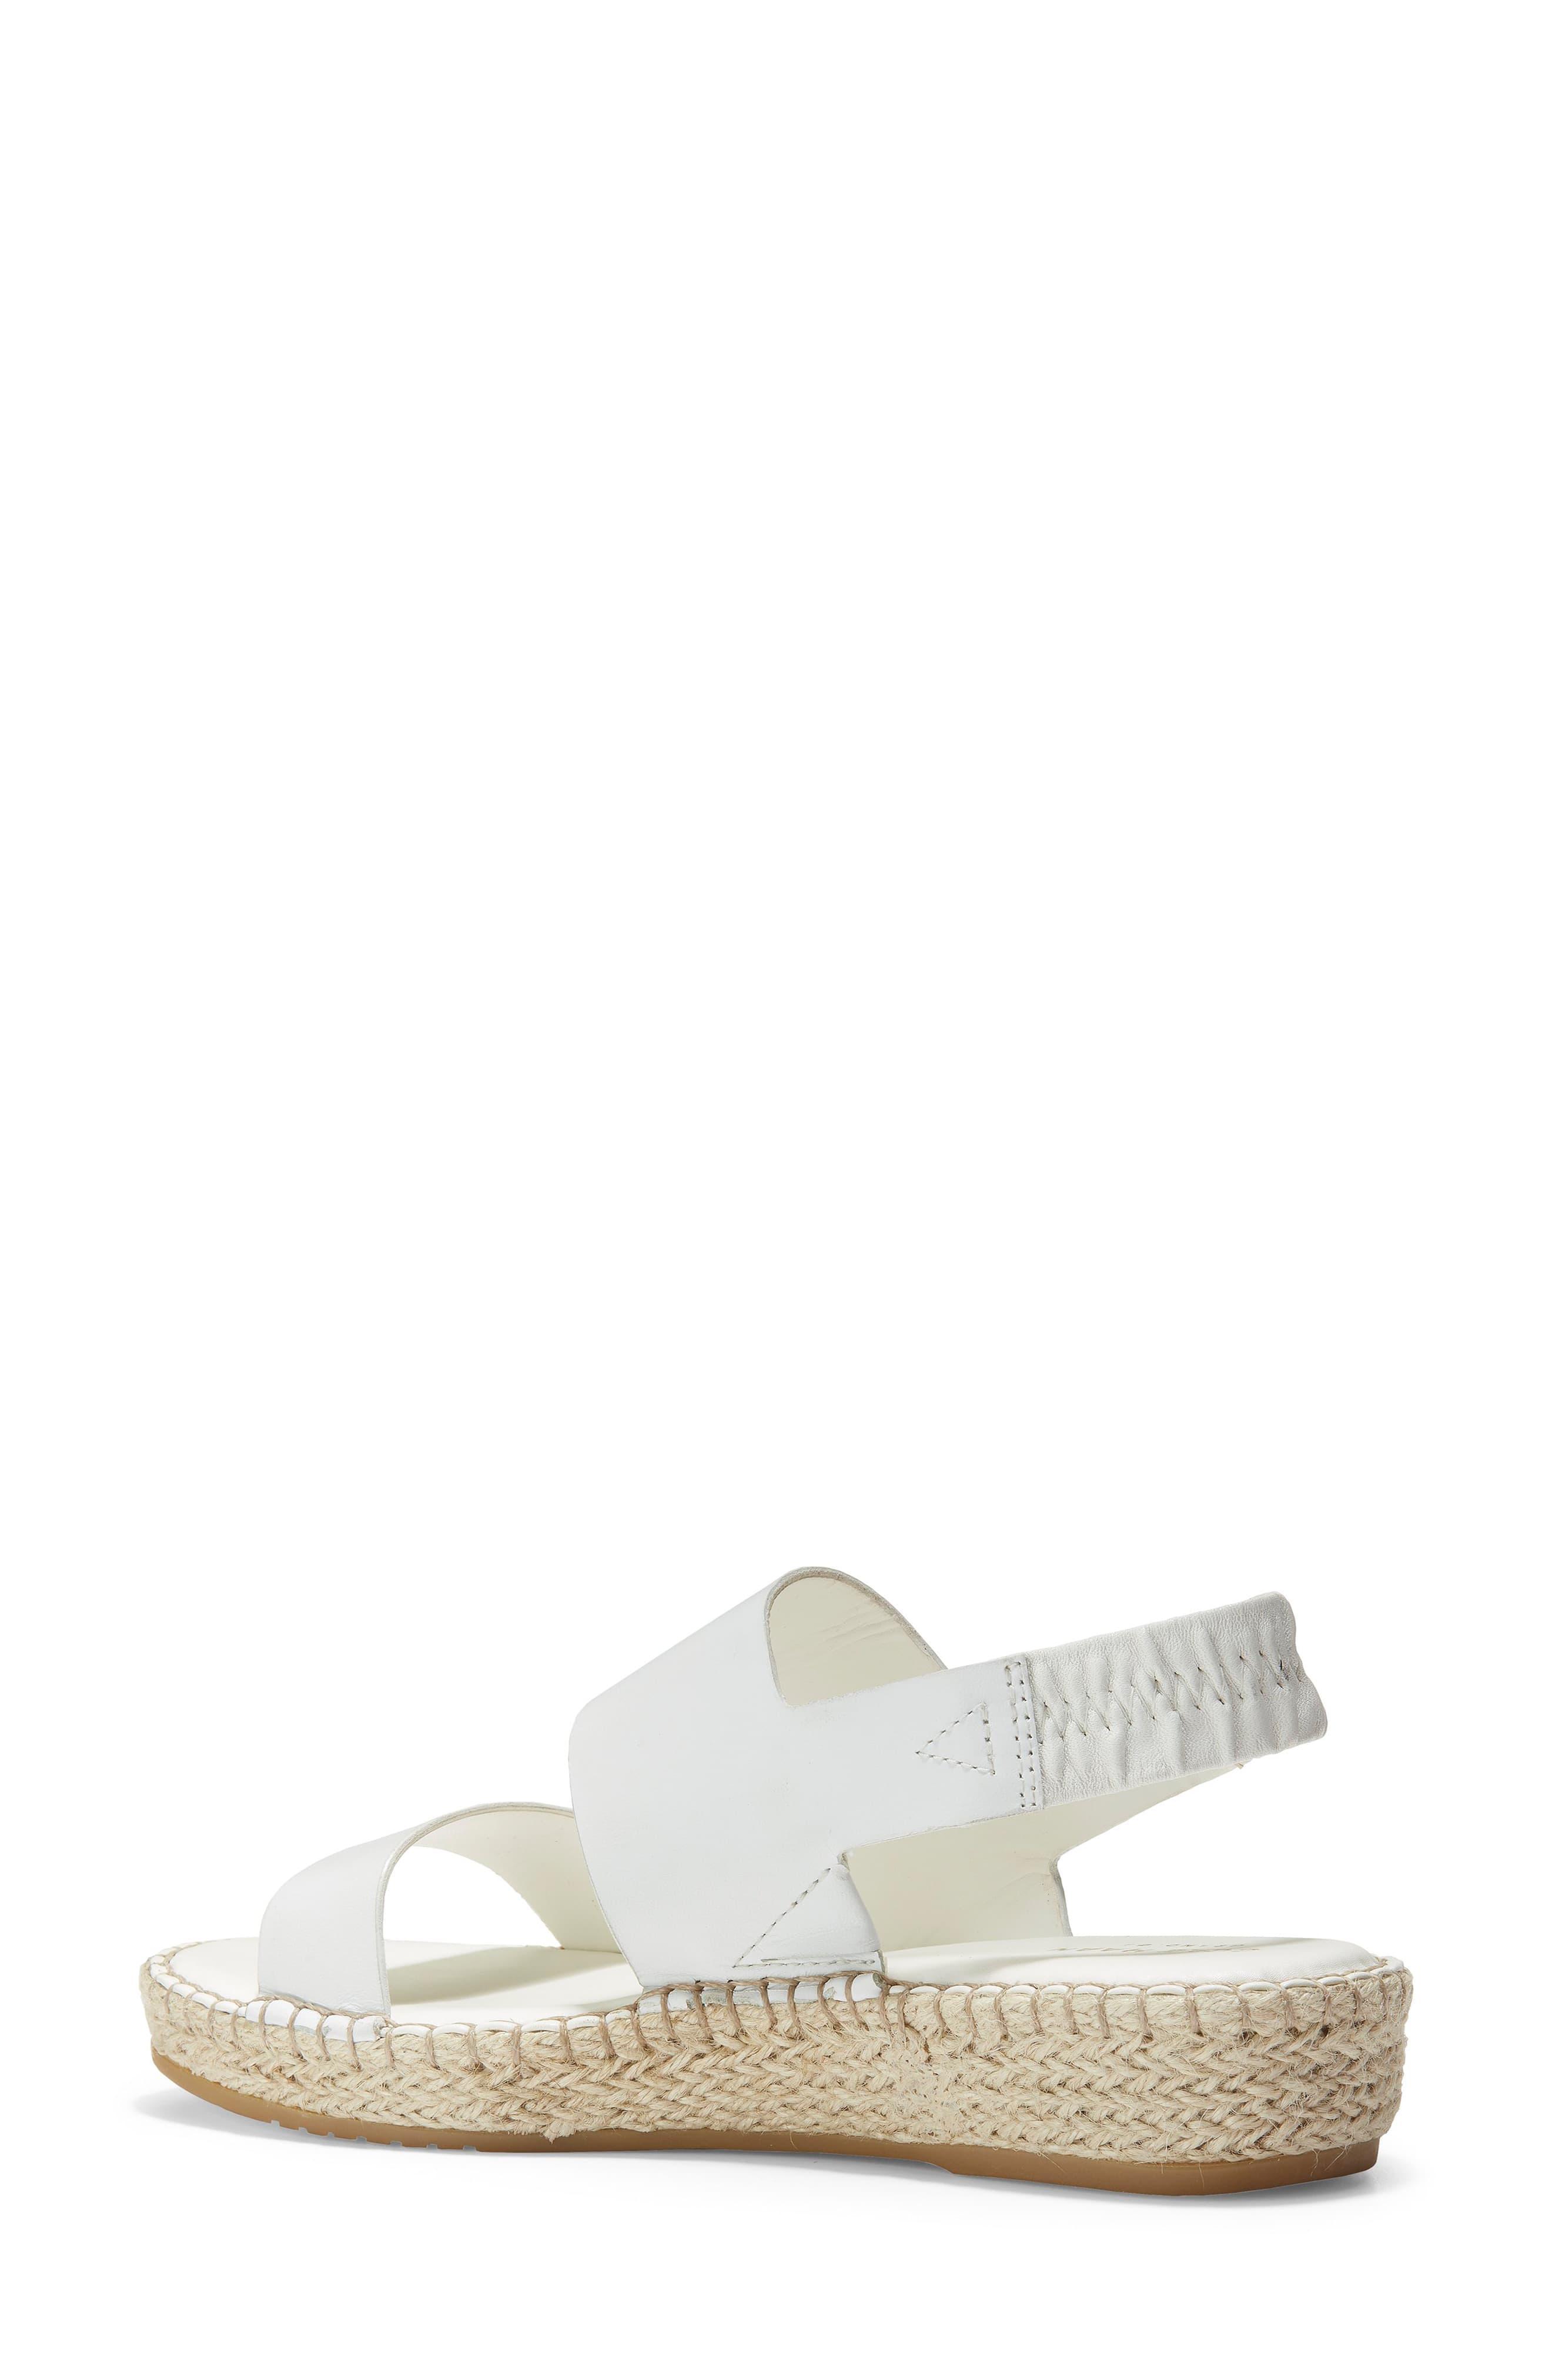 03073c43585 Women's White Cloudfeel Espadrille Sandals